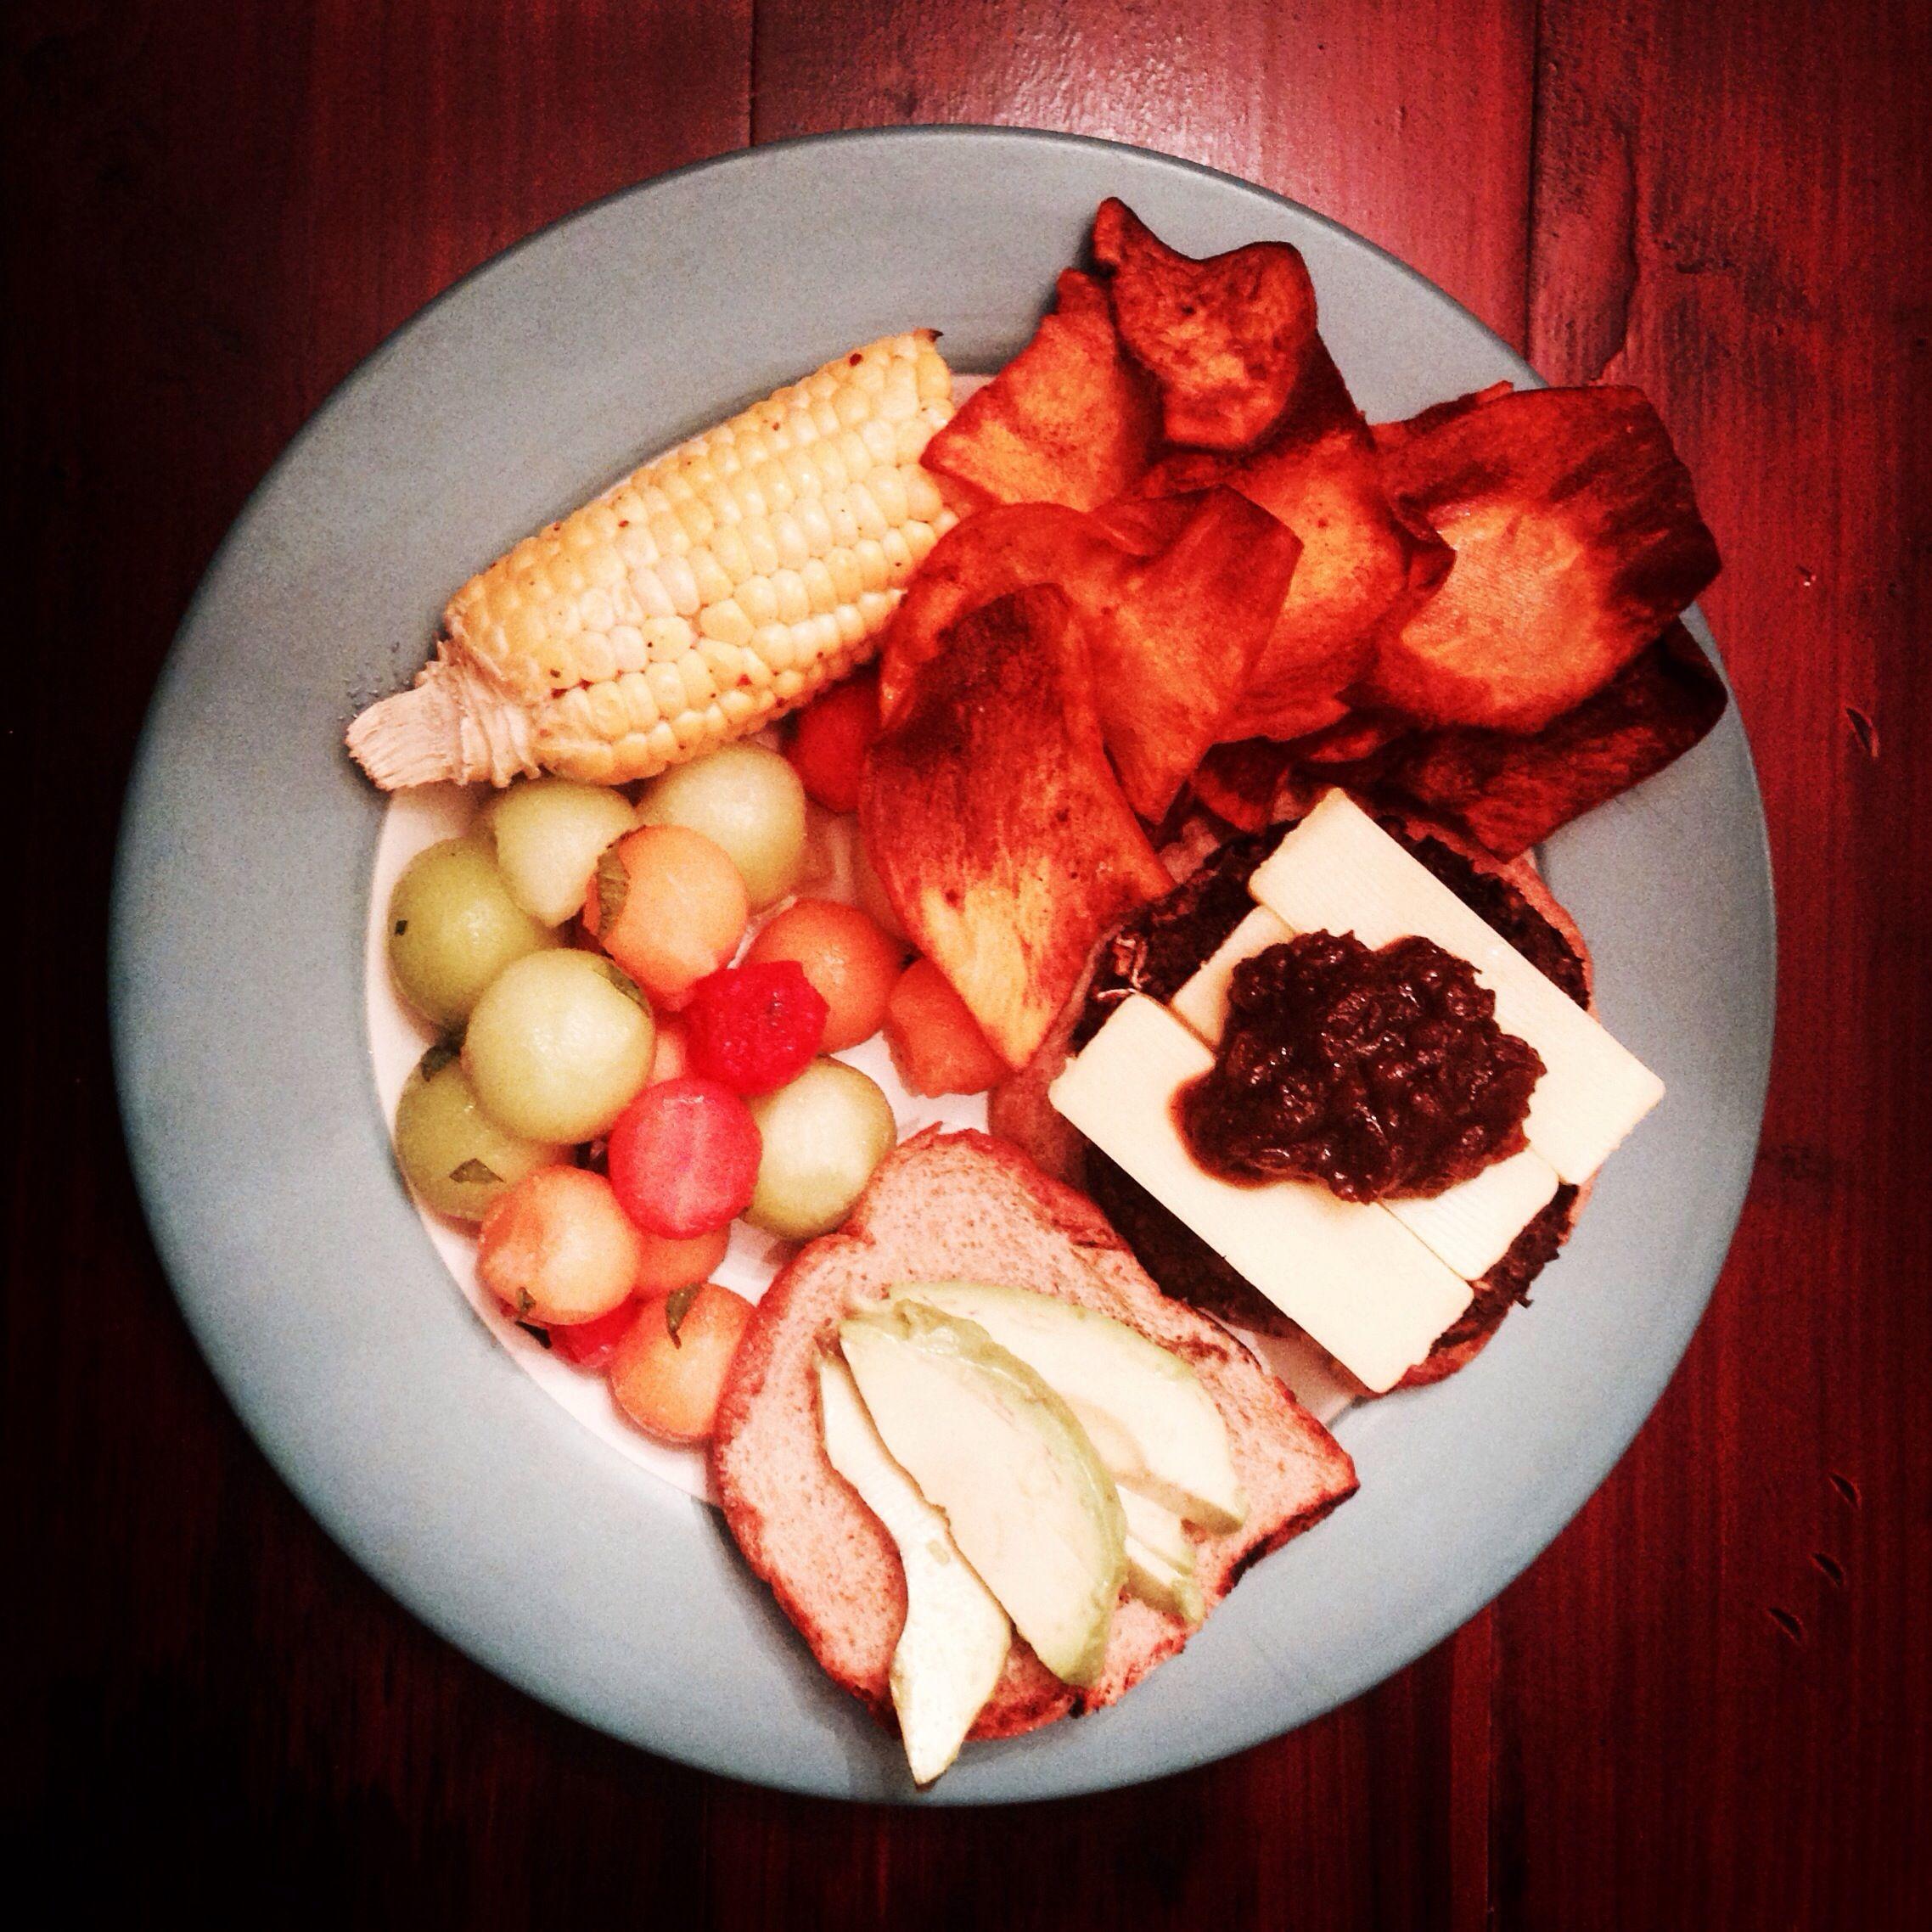 Mushroom, Kale & Black Lentil Burger | Love & Light Kitchen #VeggieBuger #LentilBurger #Vegetarian #Vegan